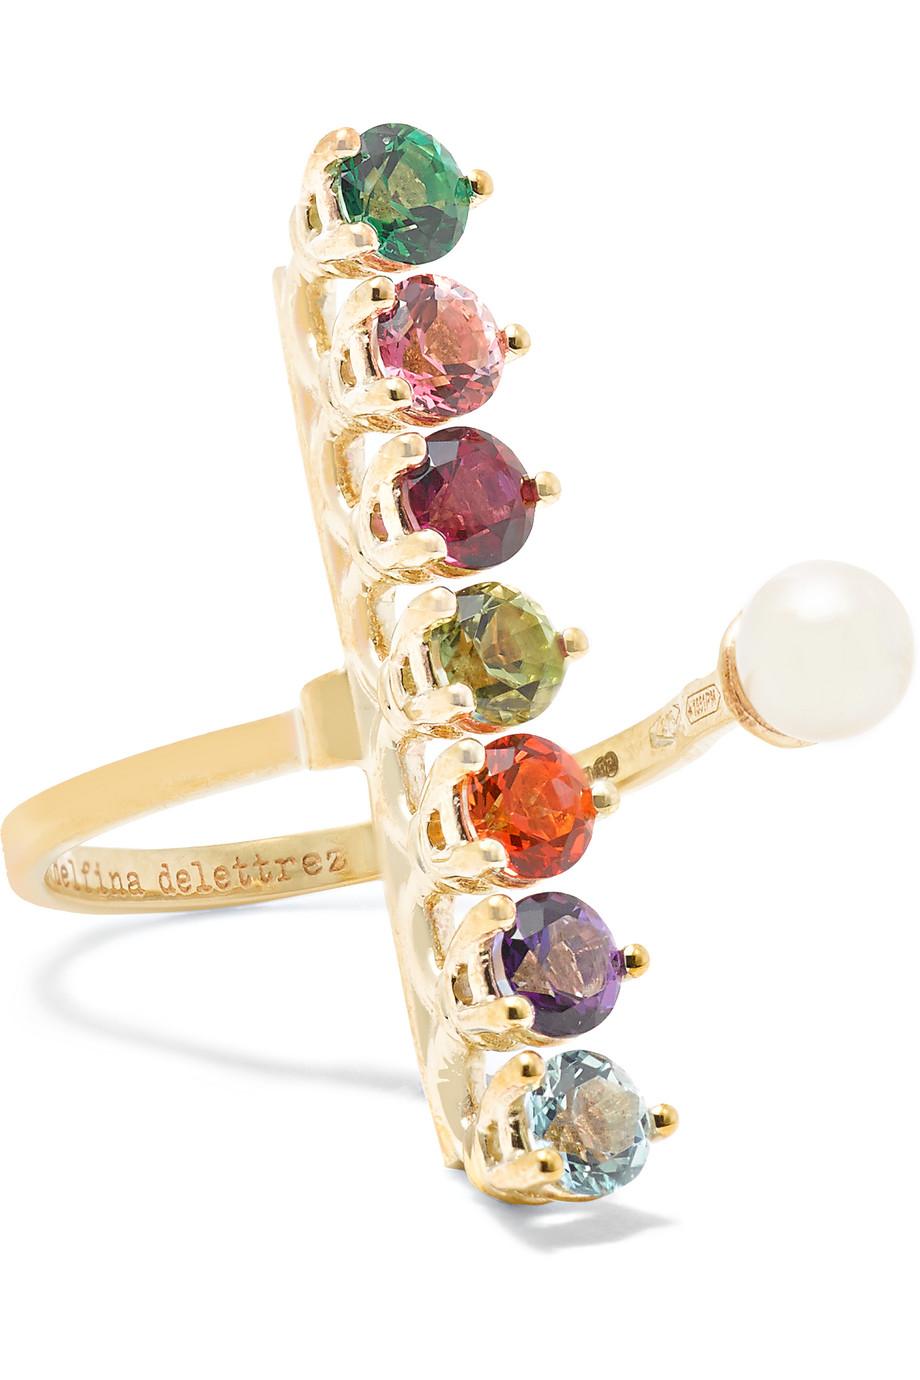 9-Karat Gold Multi-Stone Ring, Delfina Delettrez, Women's